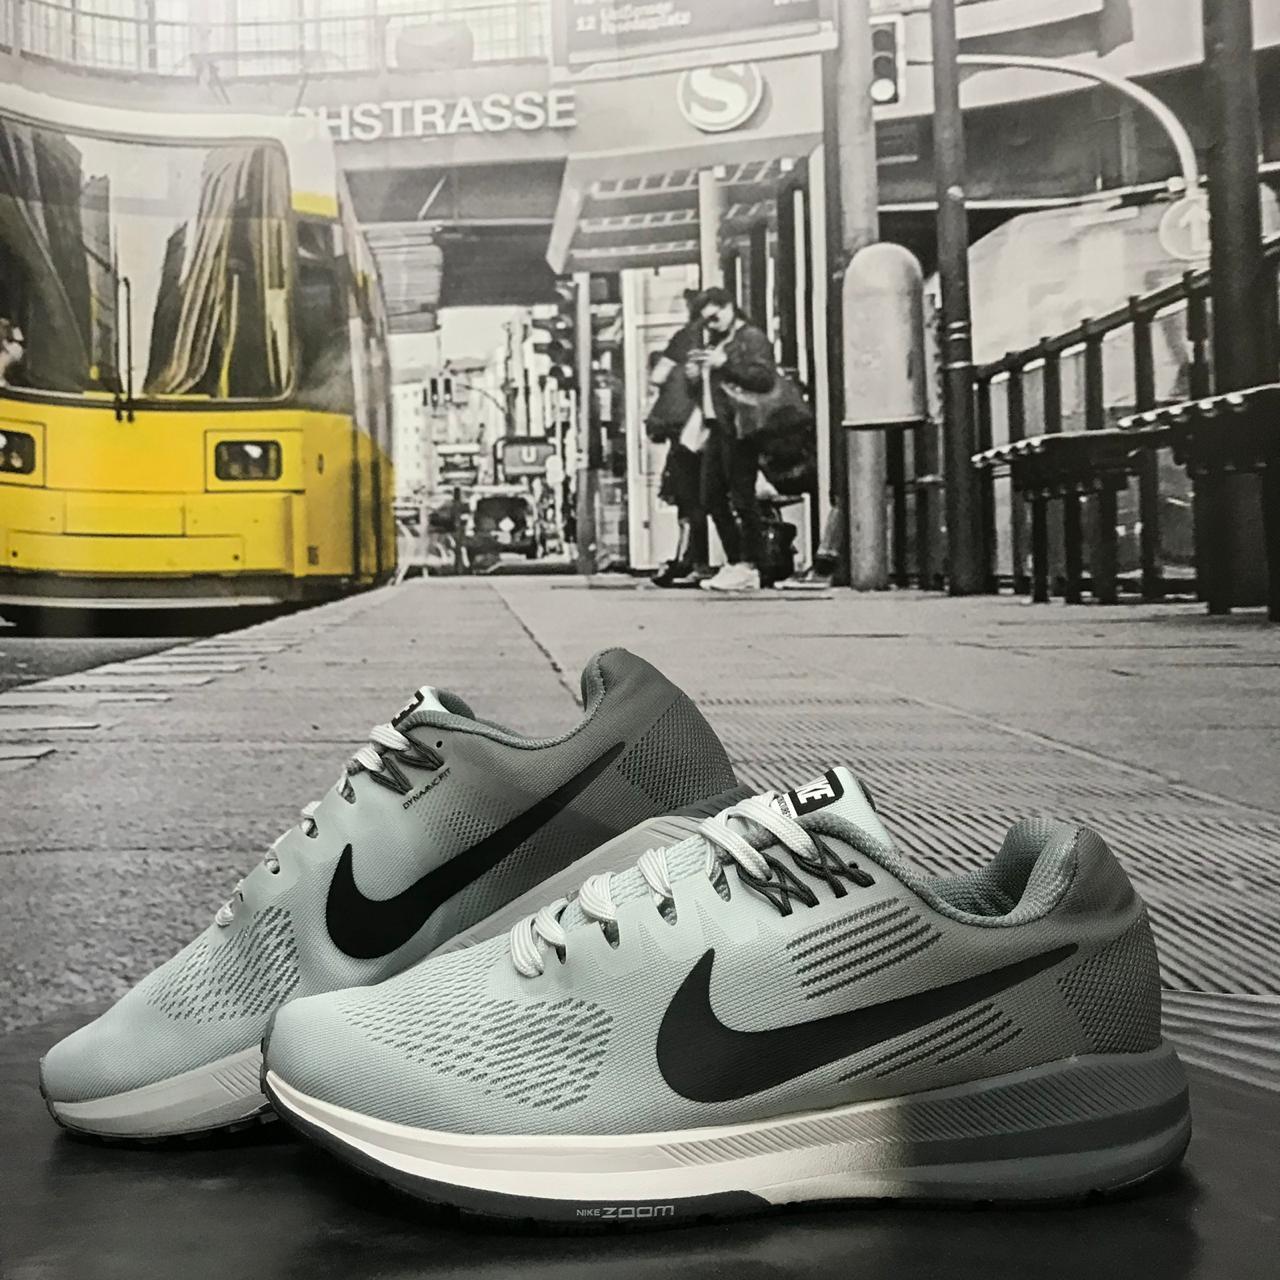 Nike Nike Caballero Zapatillas Running Cali Importados Tenis En Dama Y  d1dwqv 75931bba6ff3b